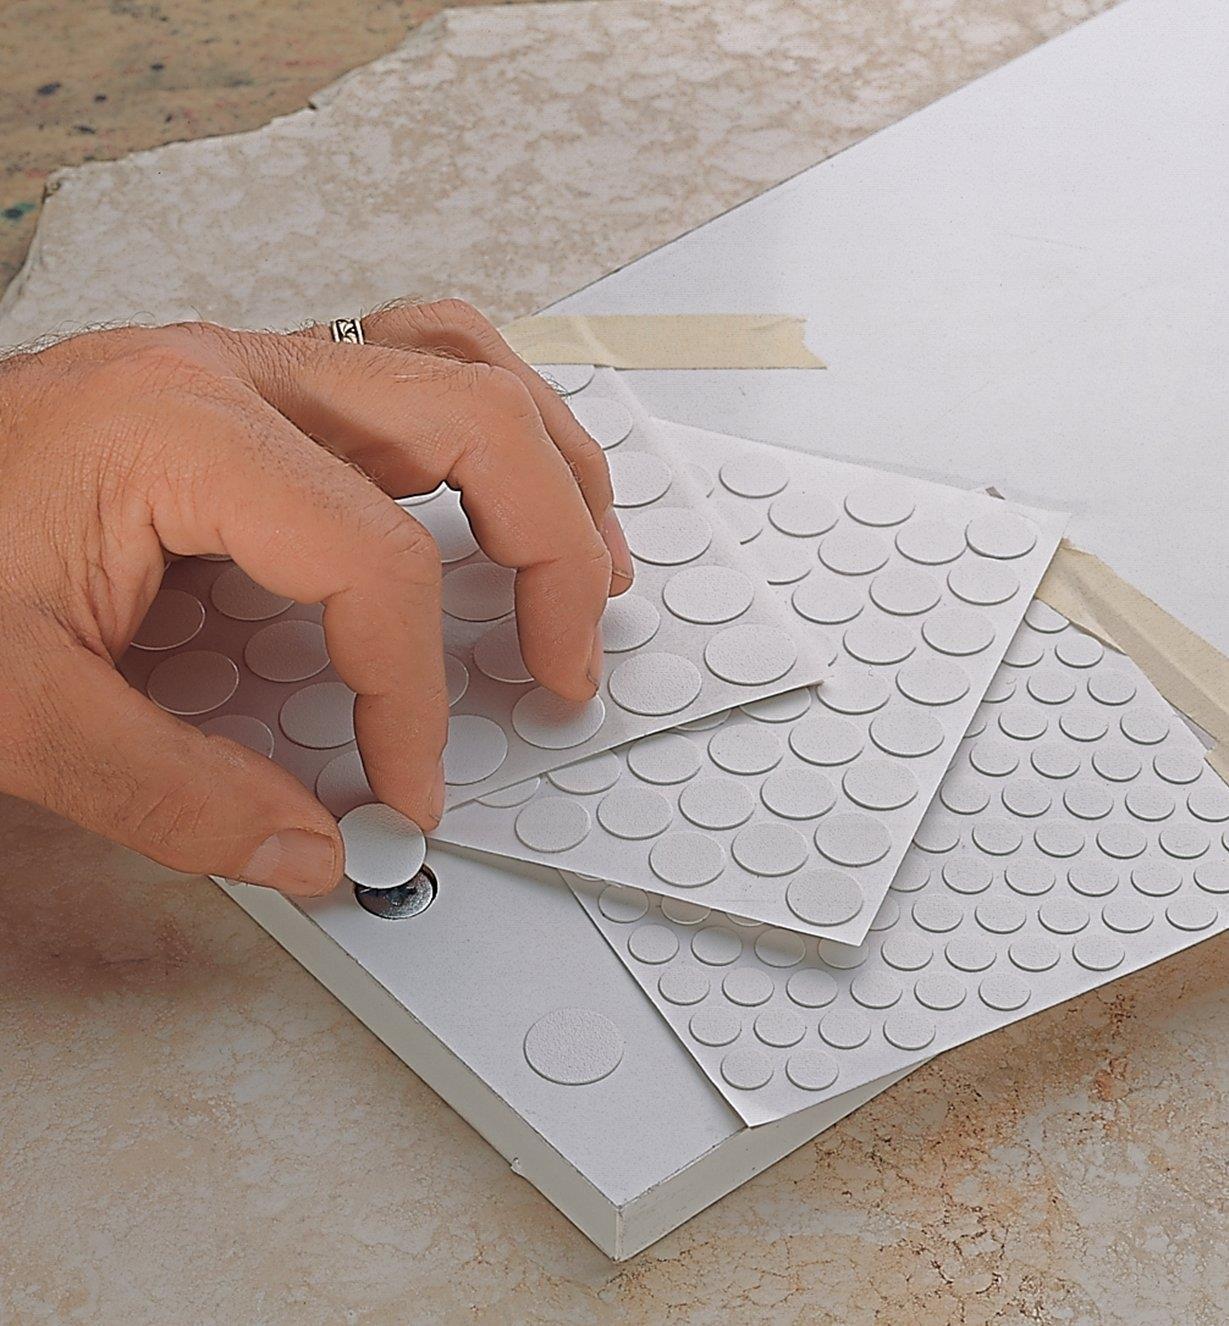 Placing a PVC Screw Cover over a screw head